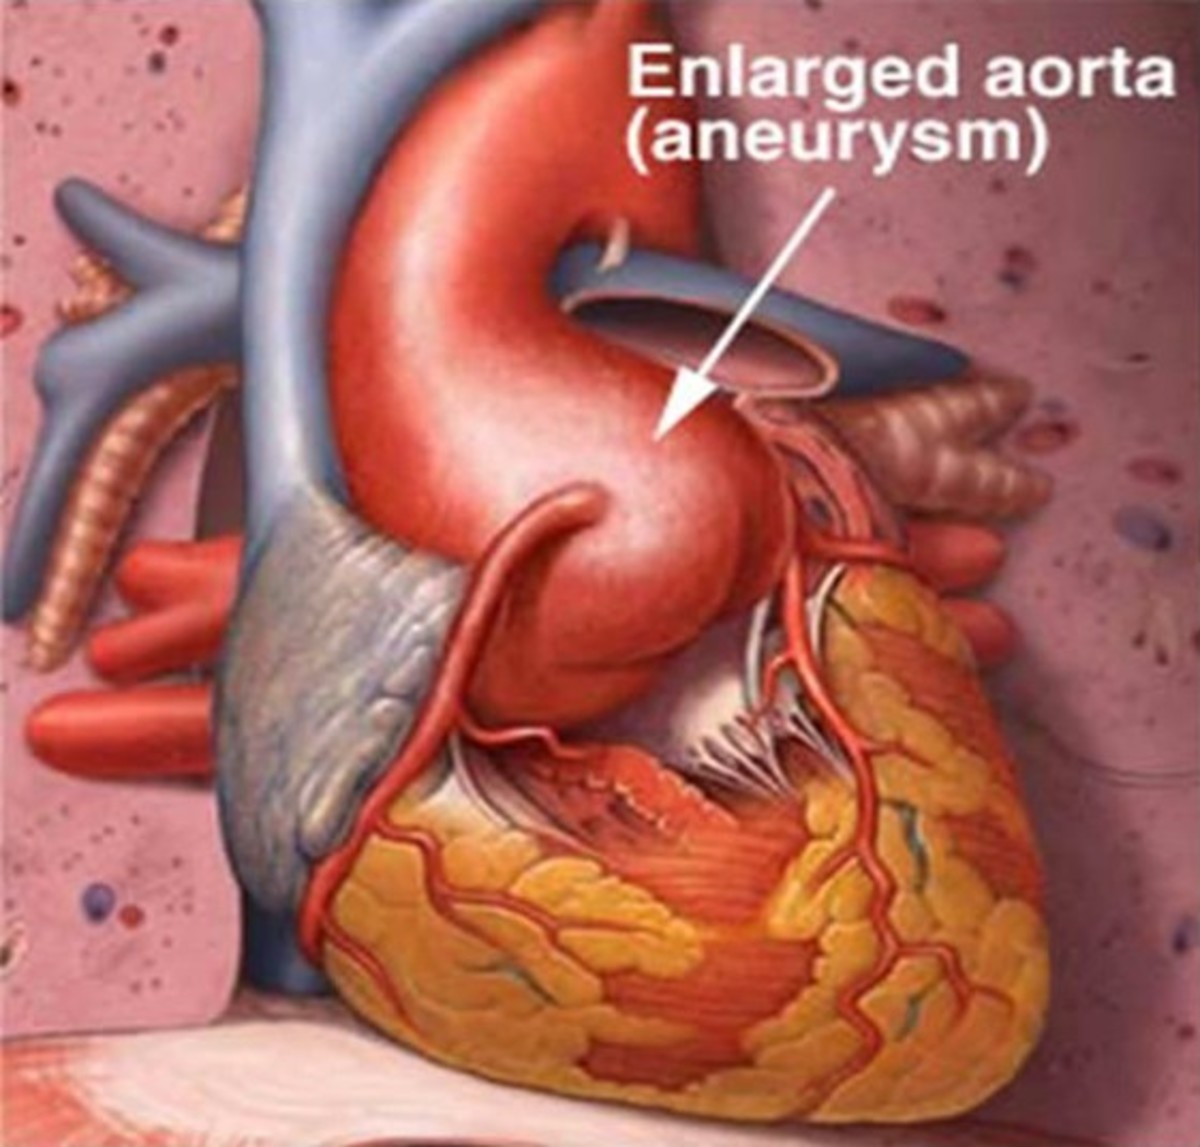 enlarged-aorta